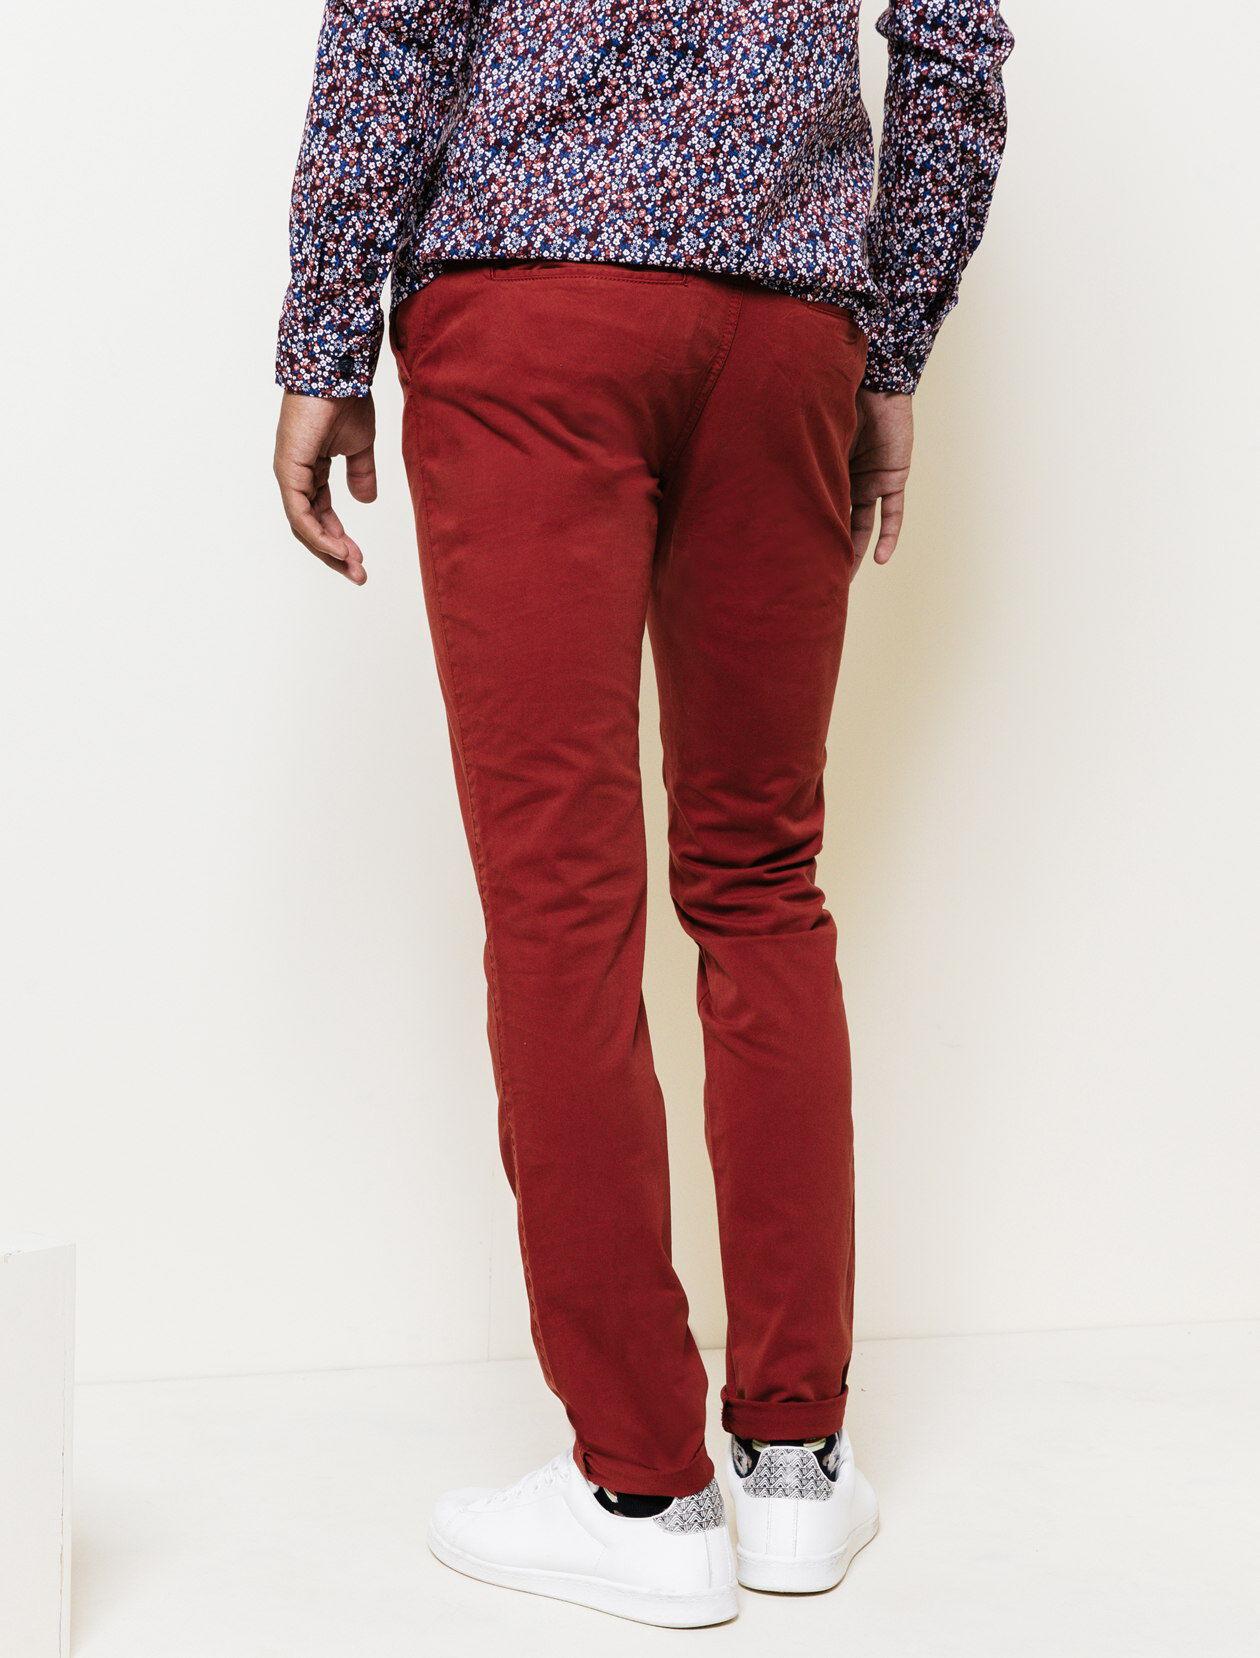 Pantalon Bizzbee Rouille Classique Chino Homme p7nw7TYzq